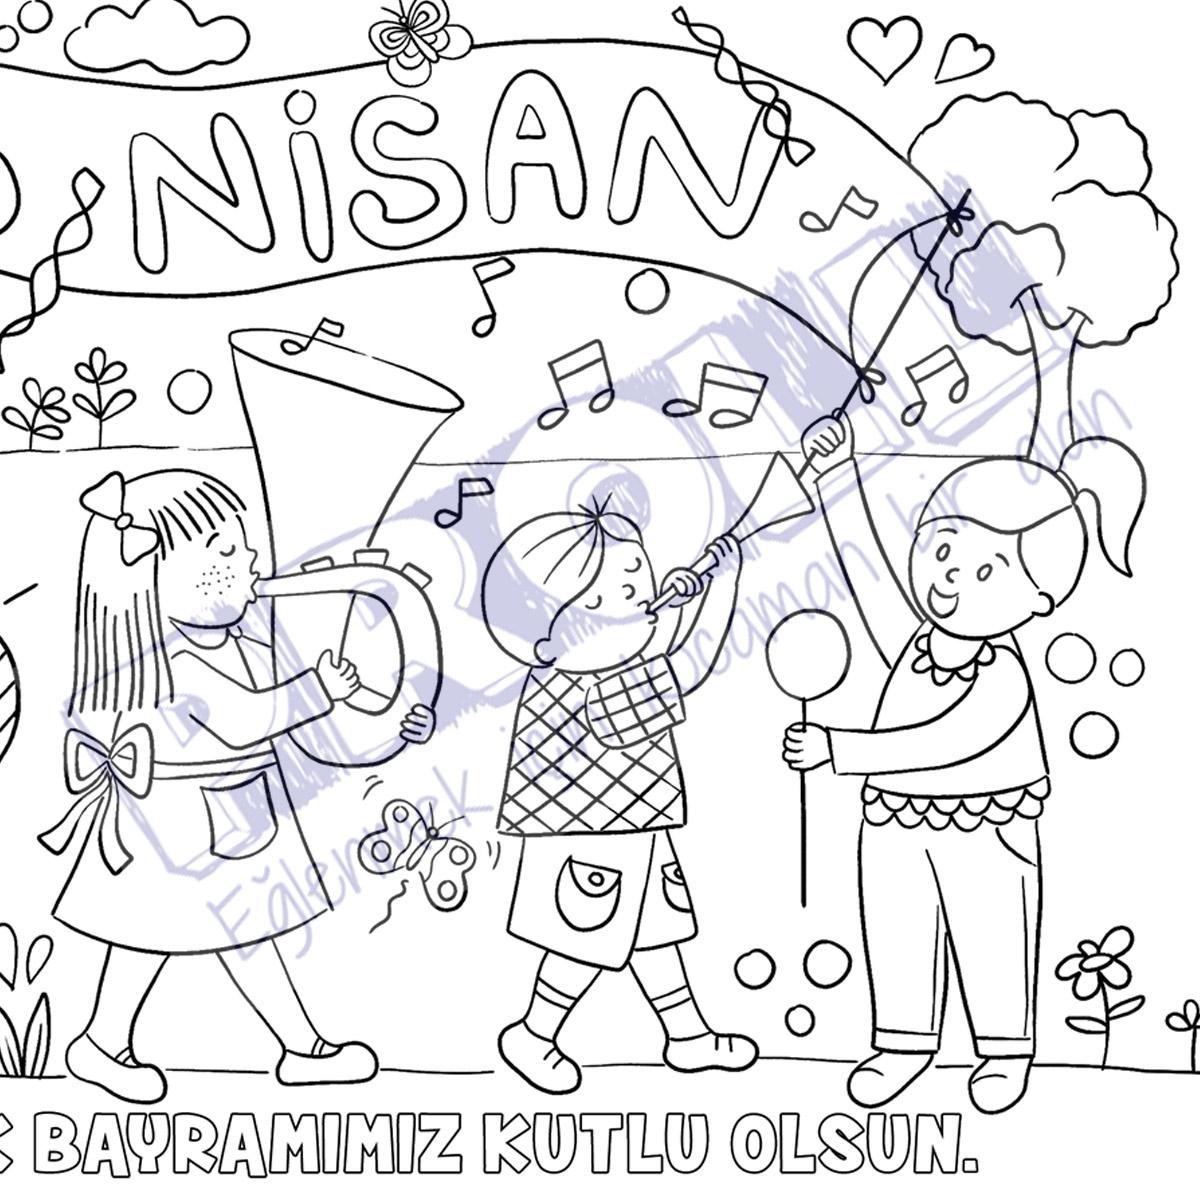 2 Prolllü 23 Nisan Sınıf Kampanyası Proll Boyama Kağıtları